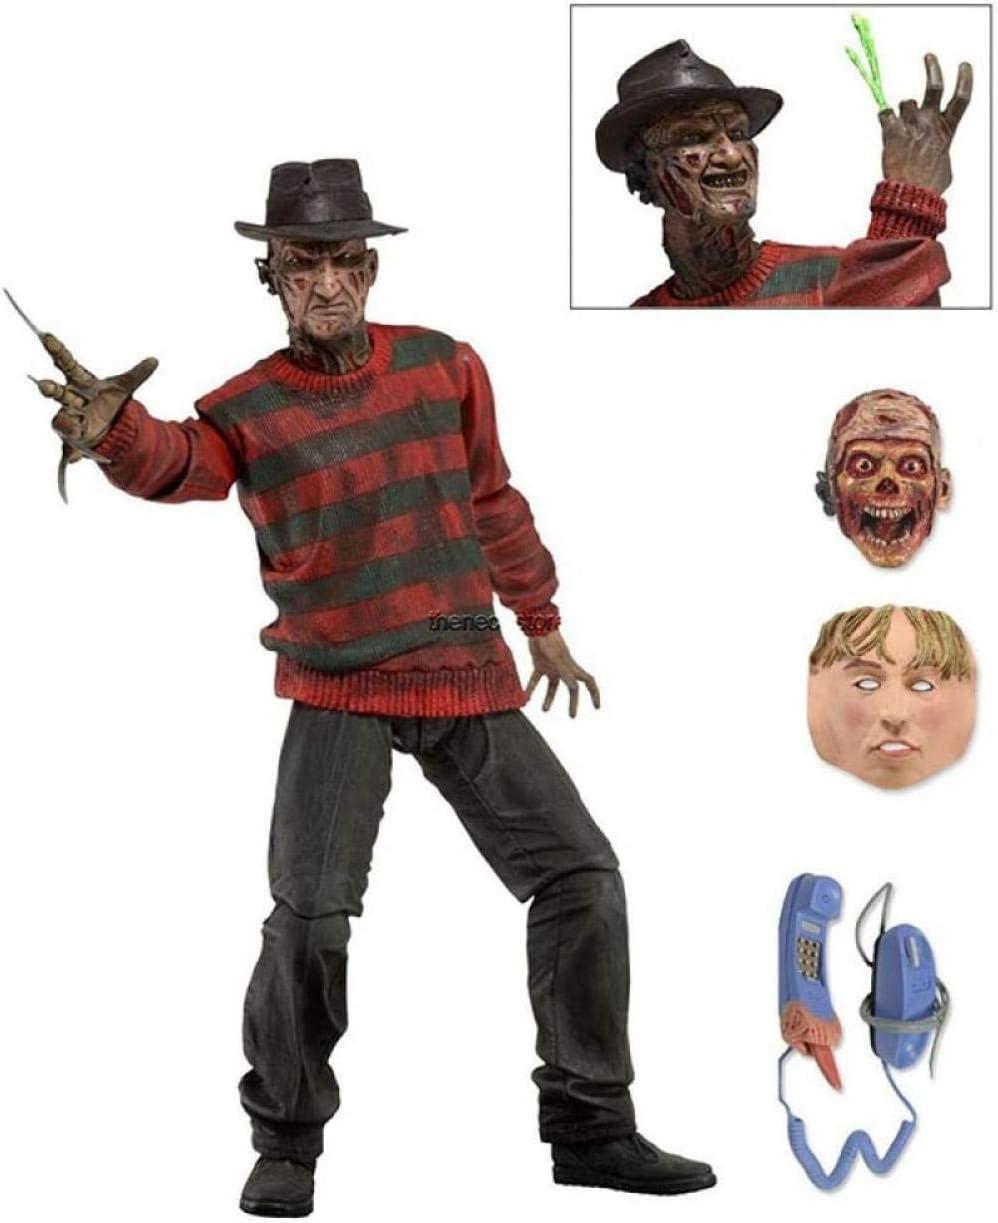 No Marioneta móvil articulada Modelo articulado Asesino Freddy 7 Pulgadas Estatua Adorno en Caja Altura 15 cm